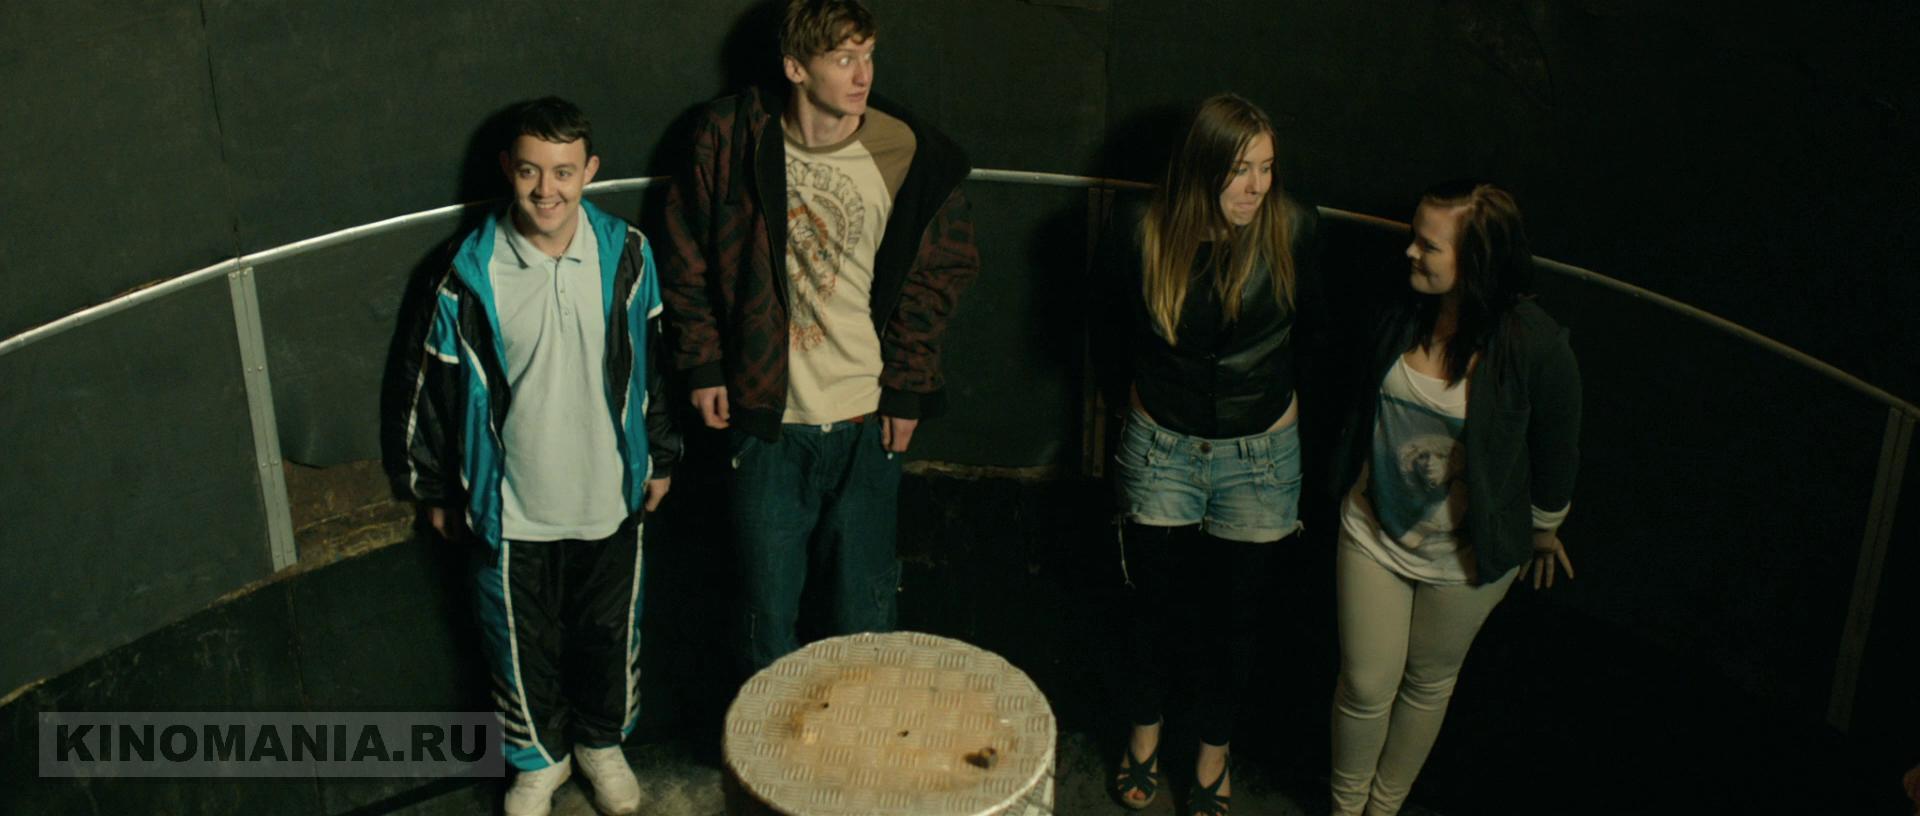 devstvenniki-beregites-film-2013